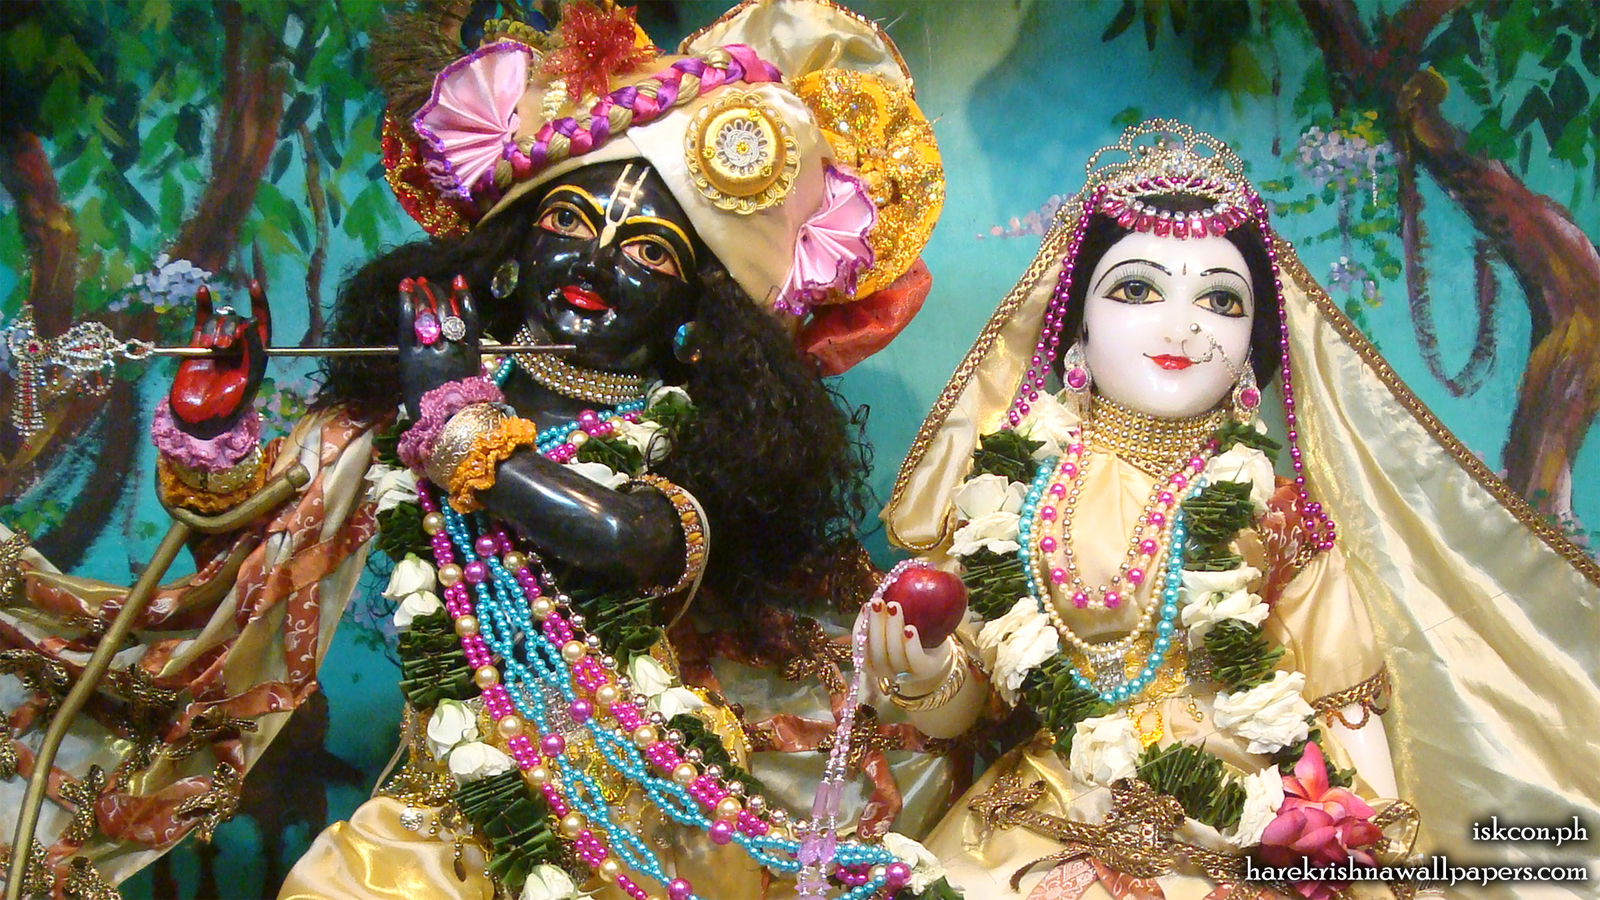 Sri Sri Radha Madhava Close up Wallpaper (010) Size 1600x900 Download